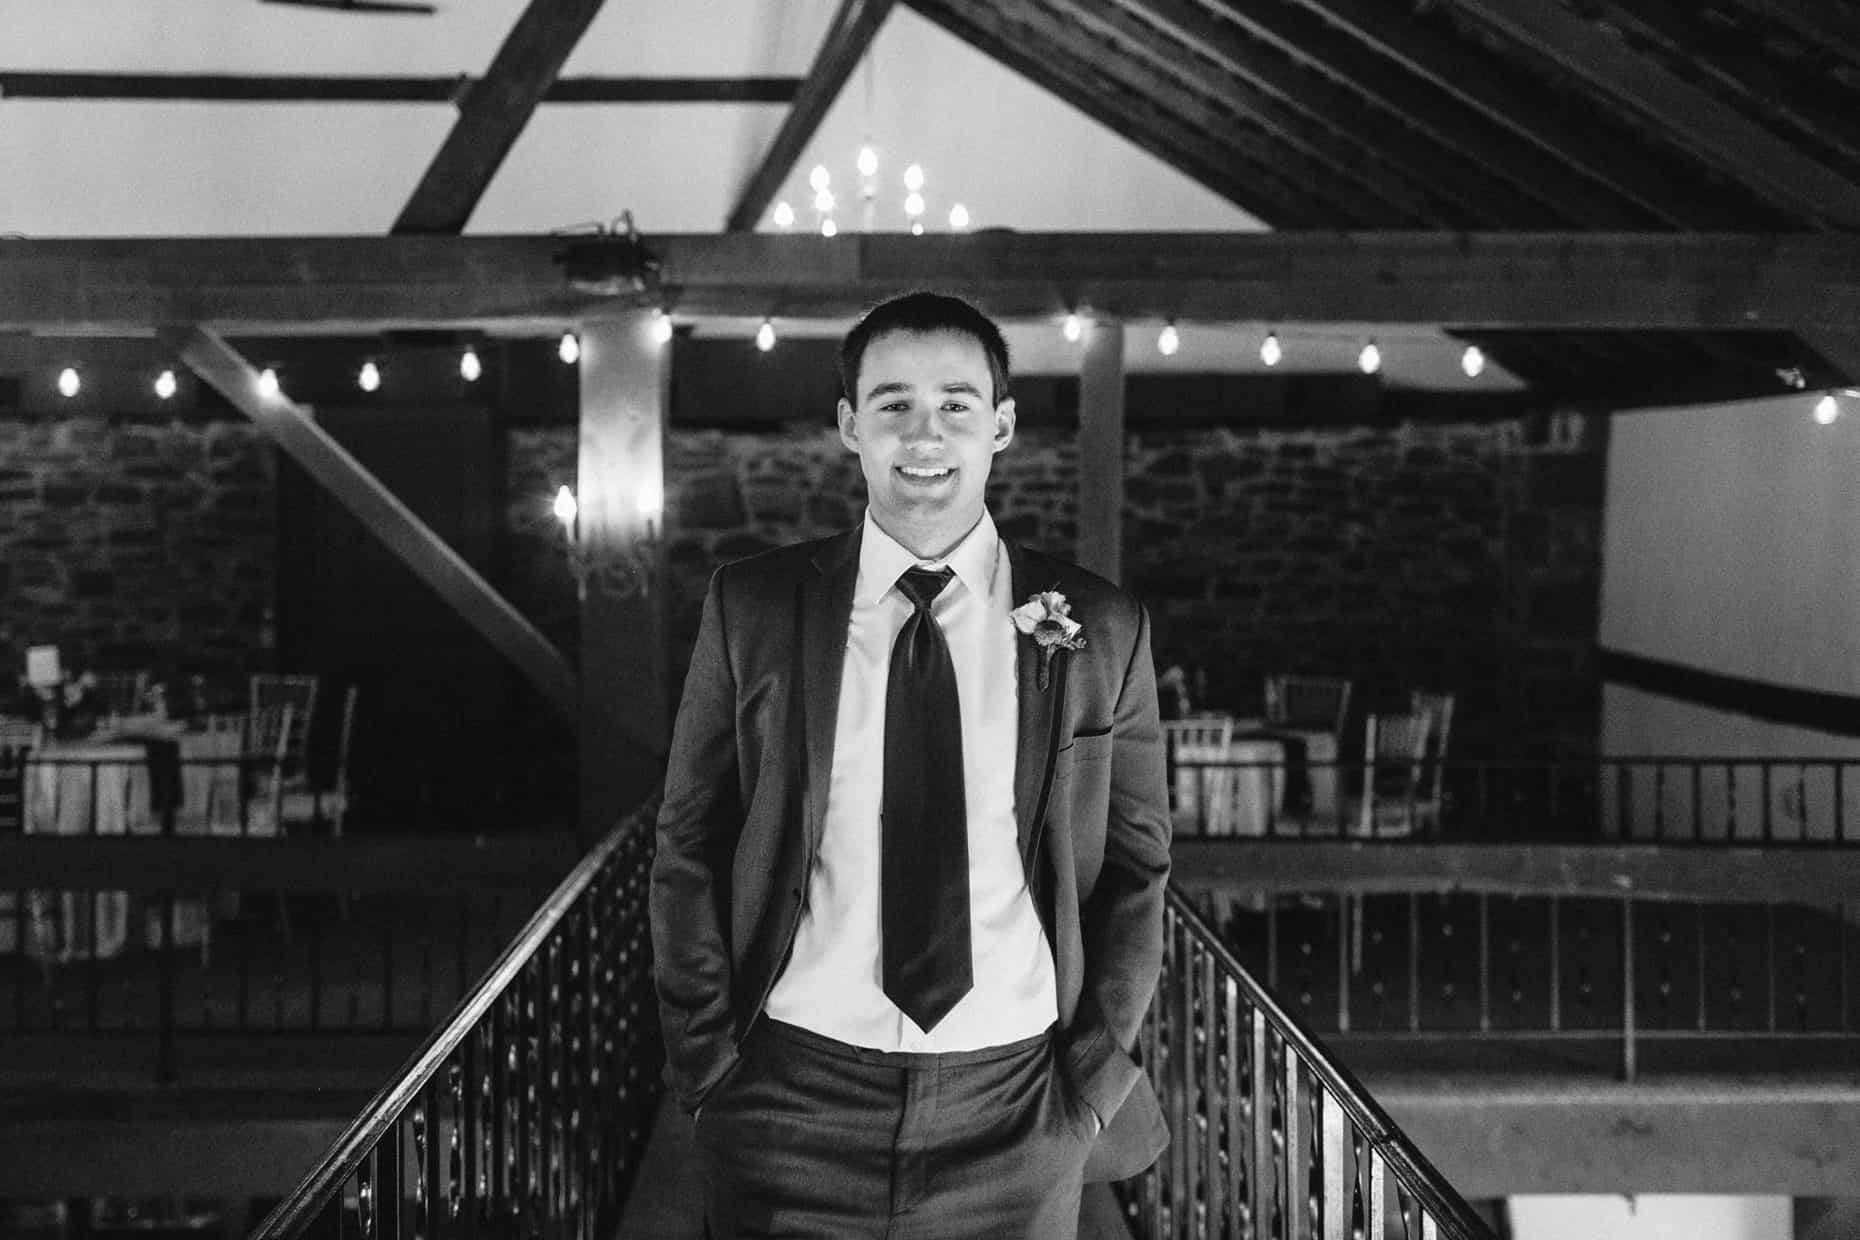 Barn on Bridge Wedding Pictures